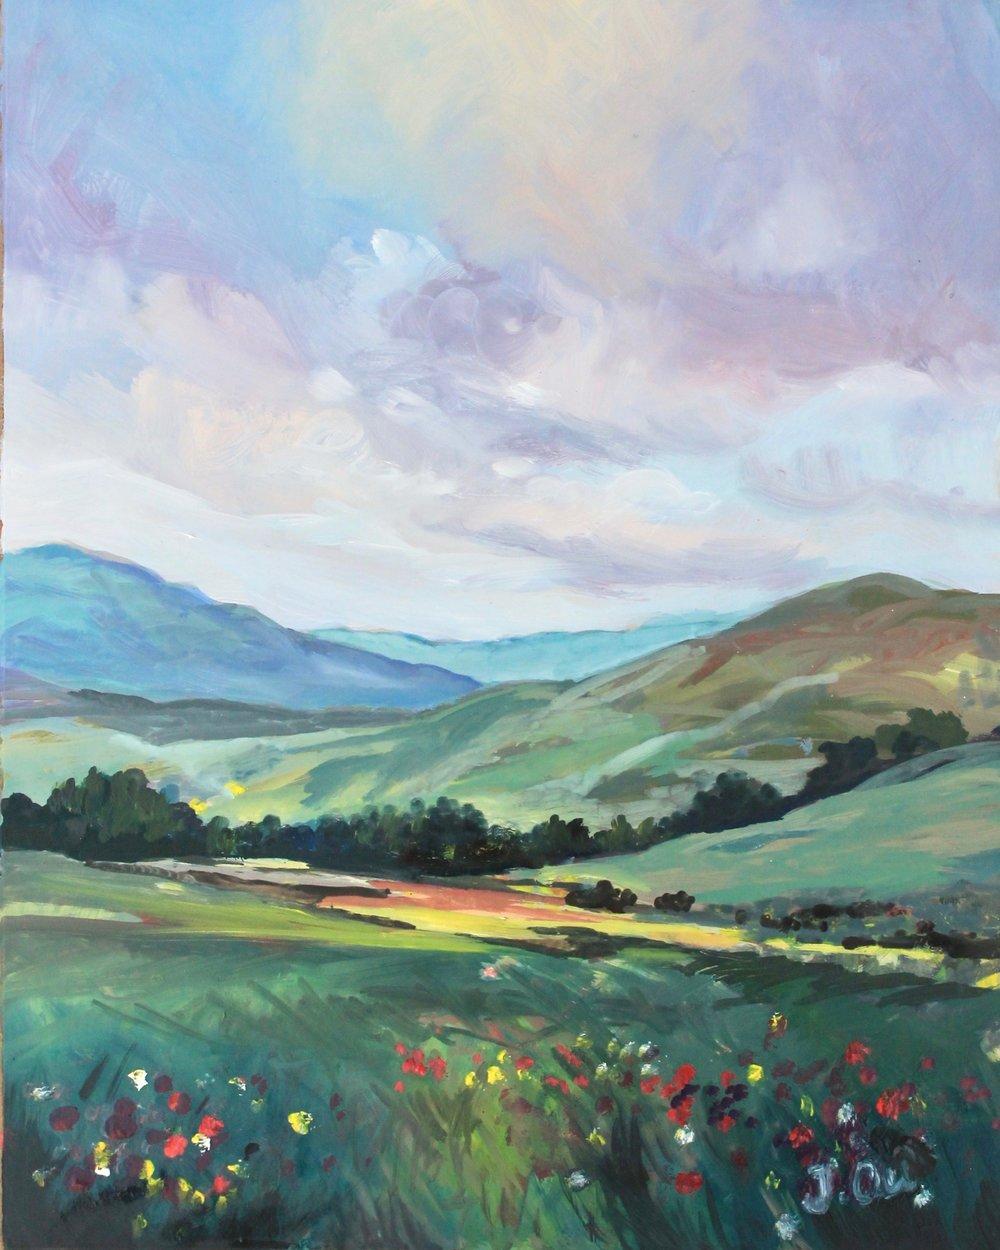 Hills & Valleys, 8x10 - sold